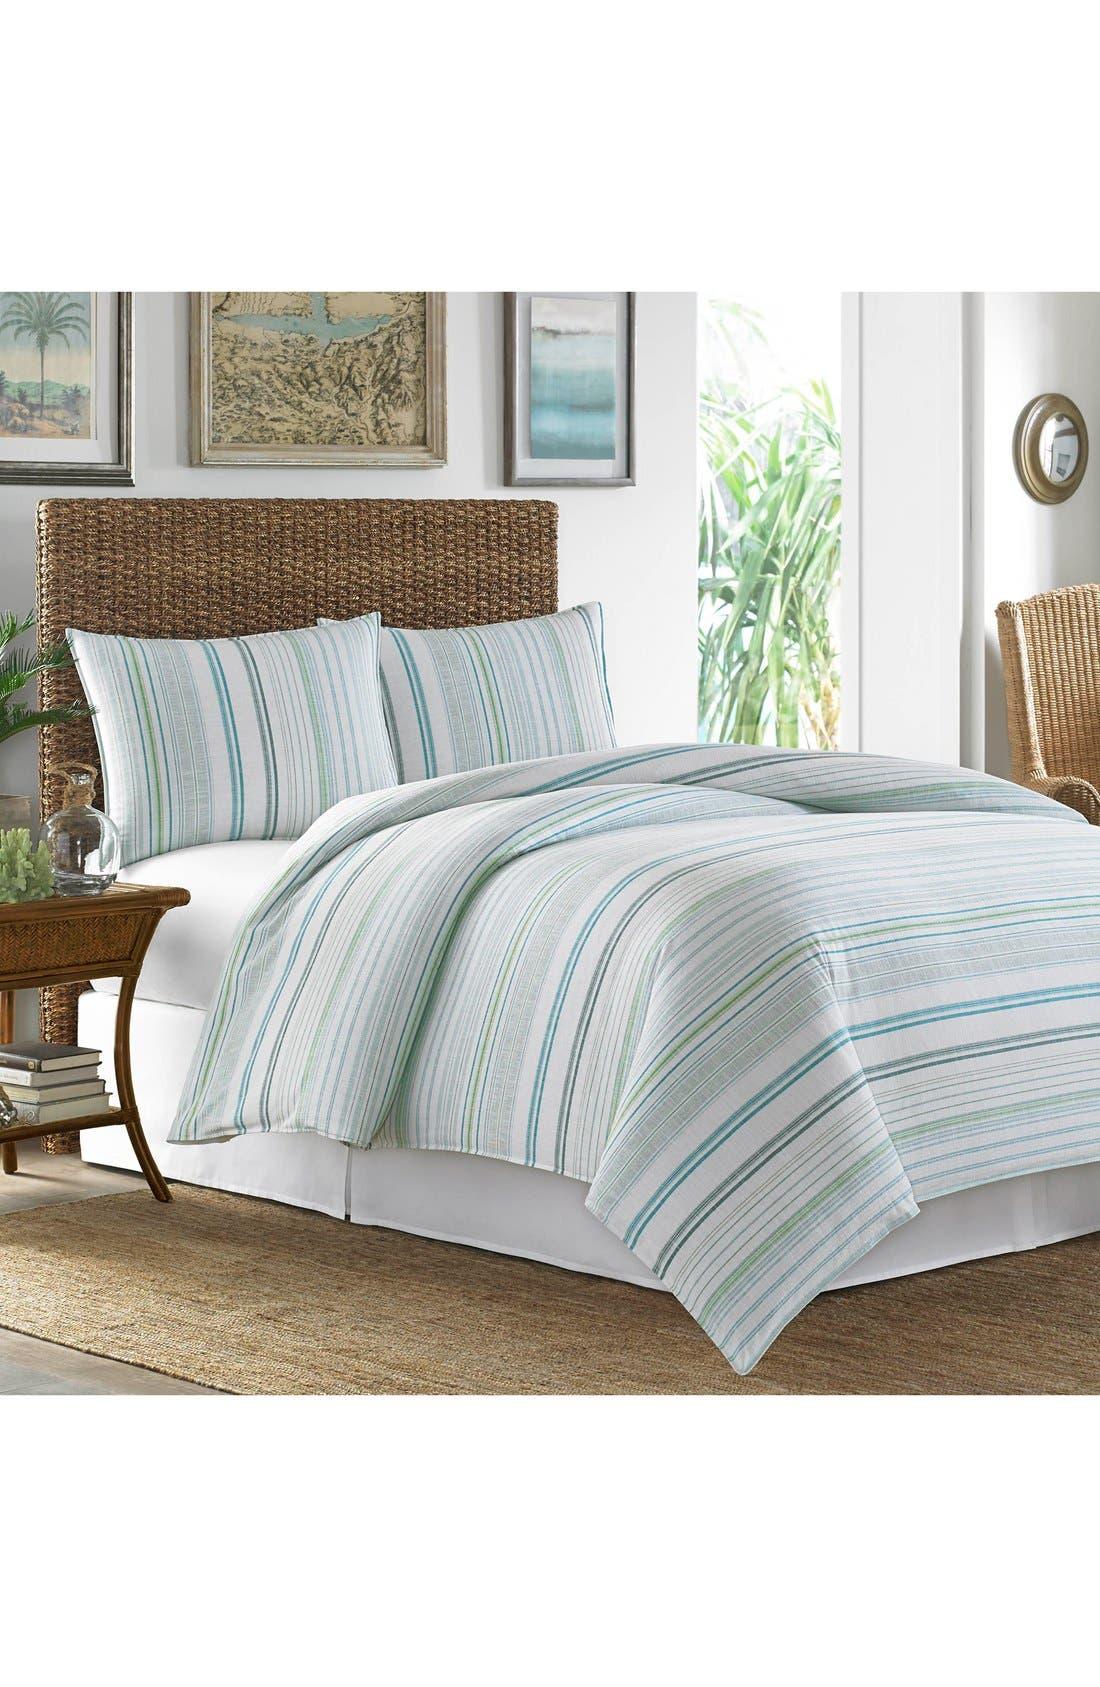 La Scala Breezer Comforter, Sham & Bed Skirt Set,                             Main thumbnail 1, color,                             Seaglass